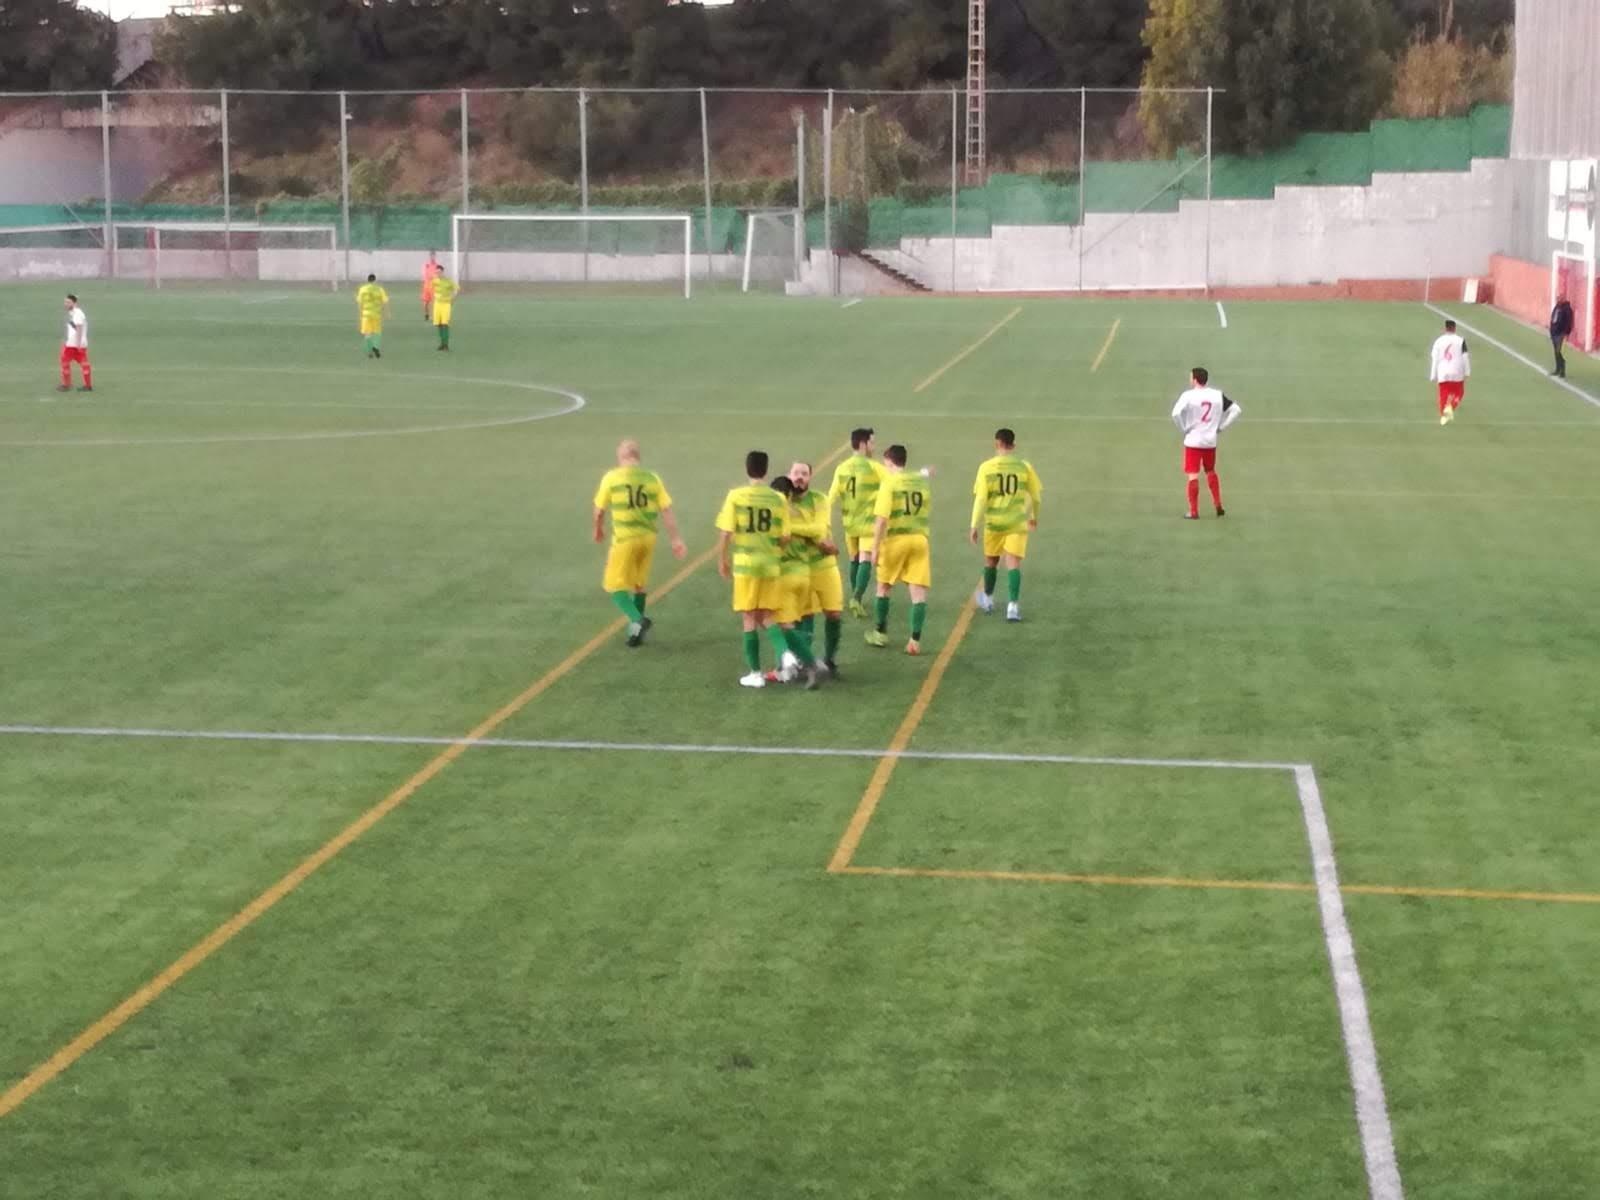 San Pancracio, 3 - Can Clota, 1